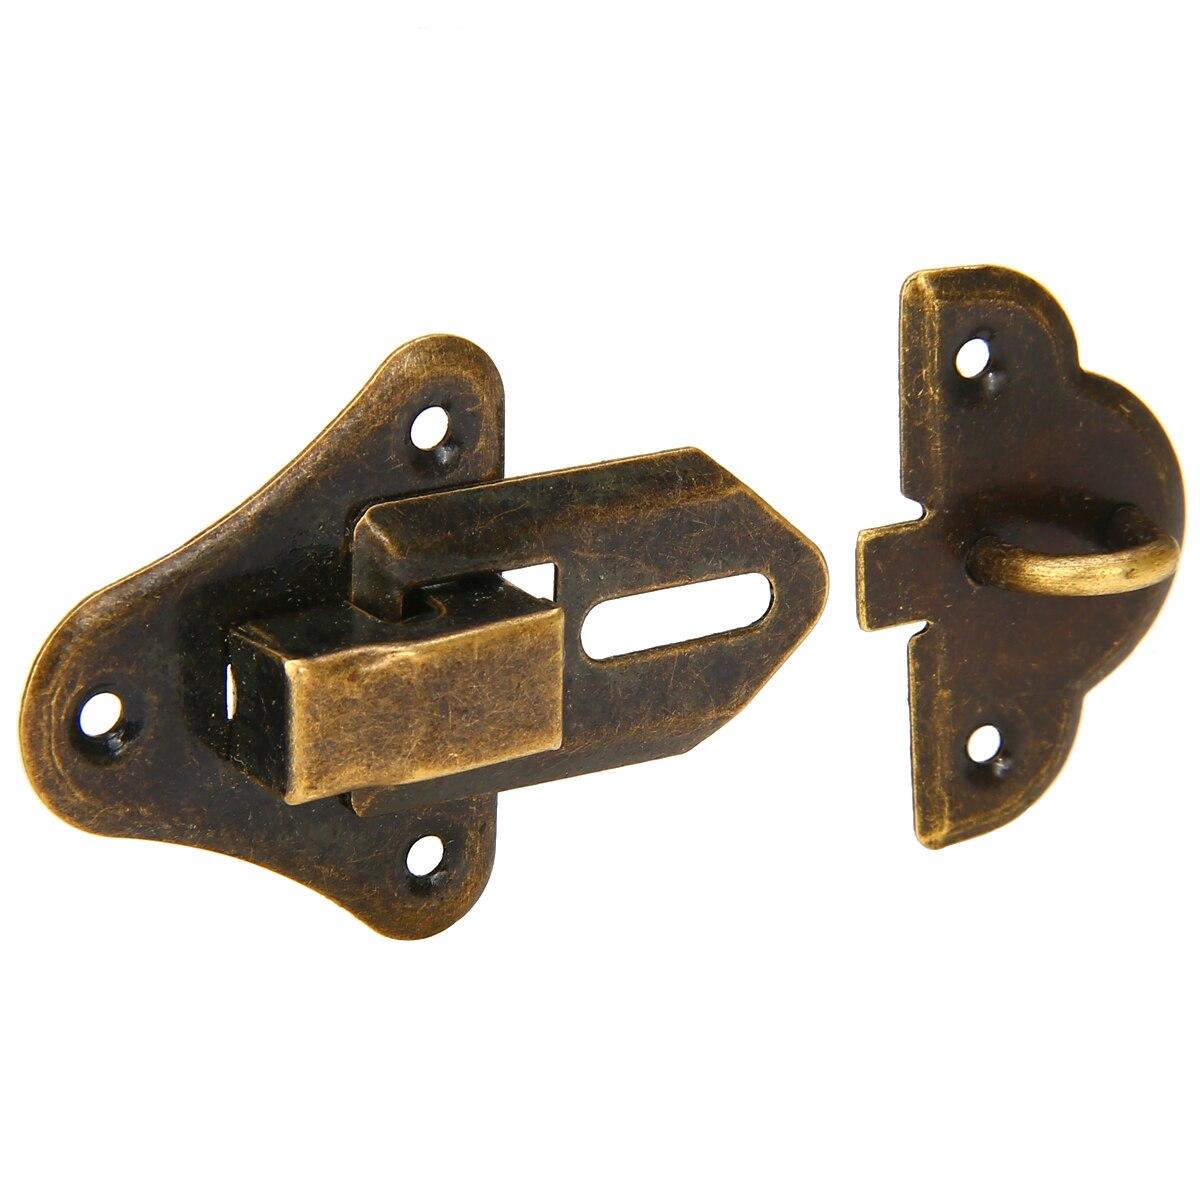 Intelligent Vintage Locks Cabinet Boxes Duckbilled Metal Toggle Latch Catch Hasp Bronze Tone Furniture